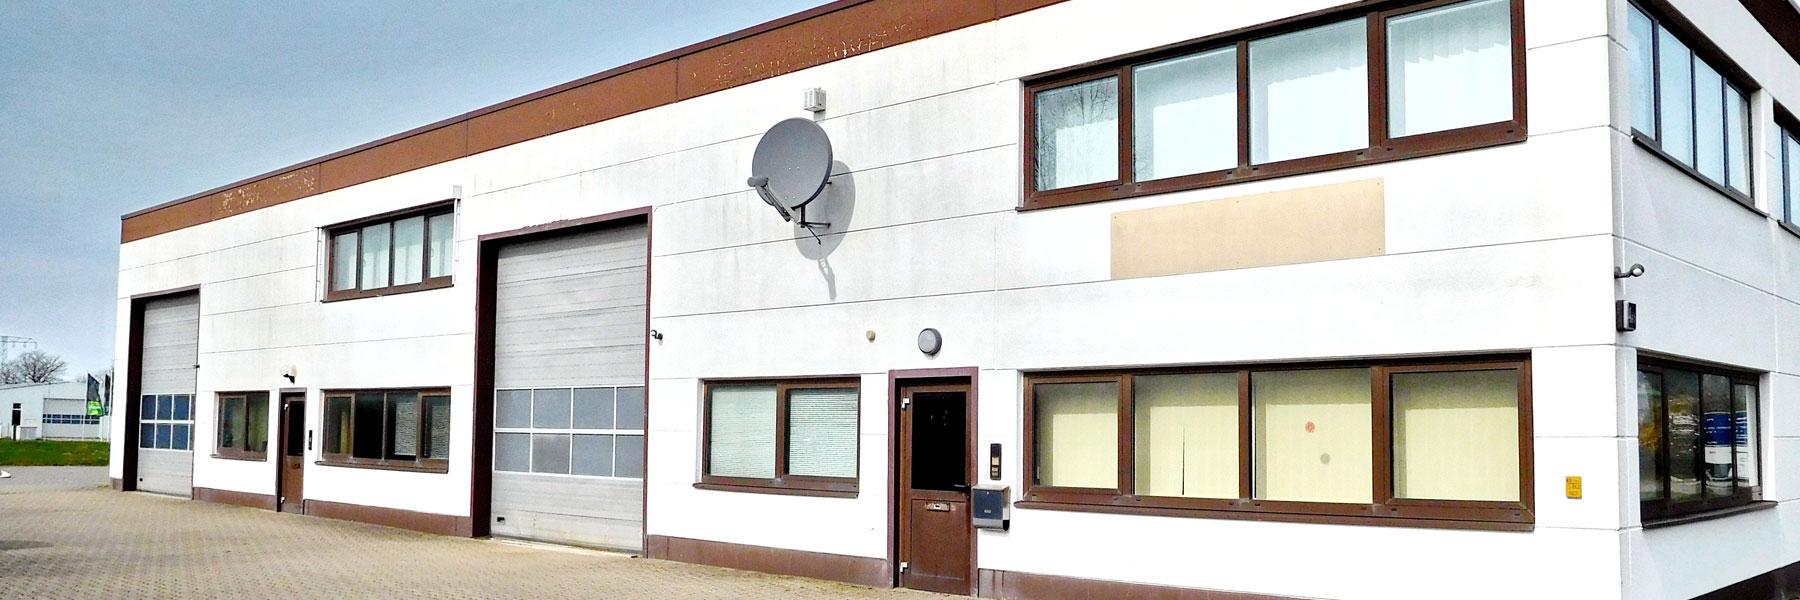 Firmengebäude - HPH Hydraulik UG